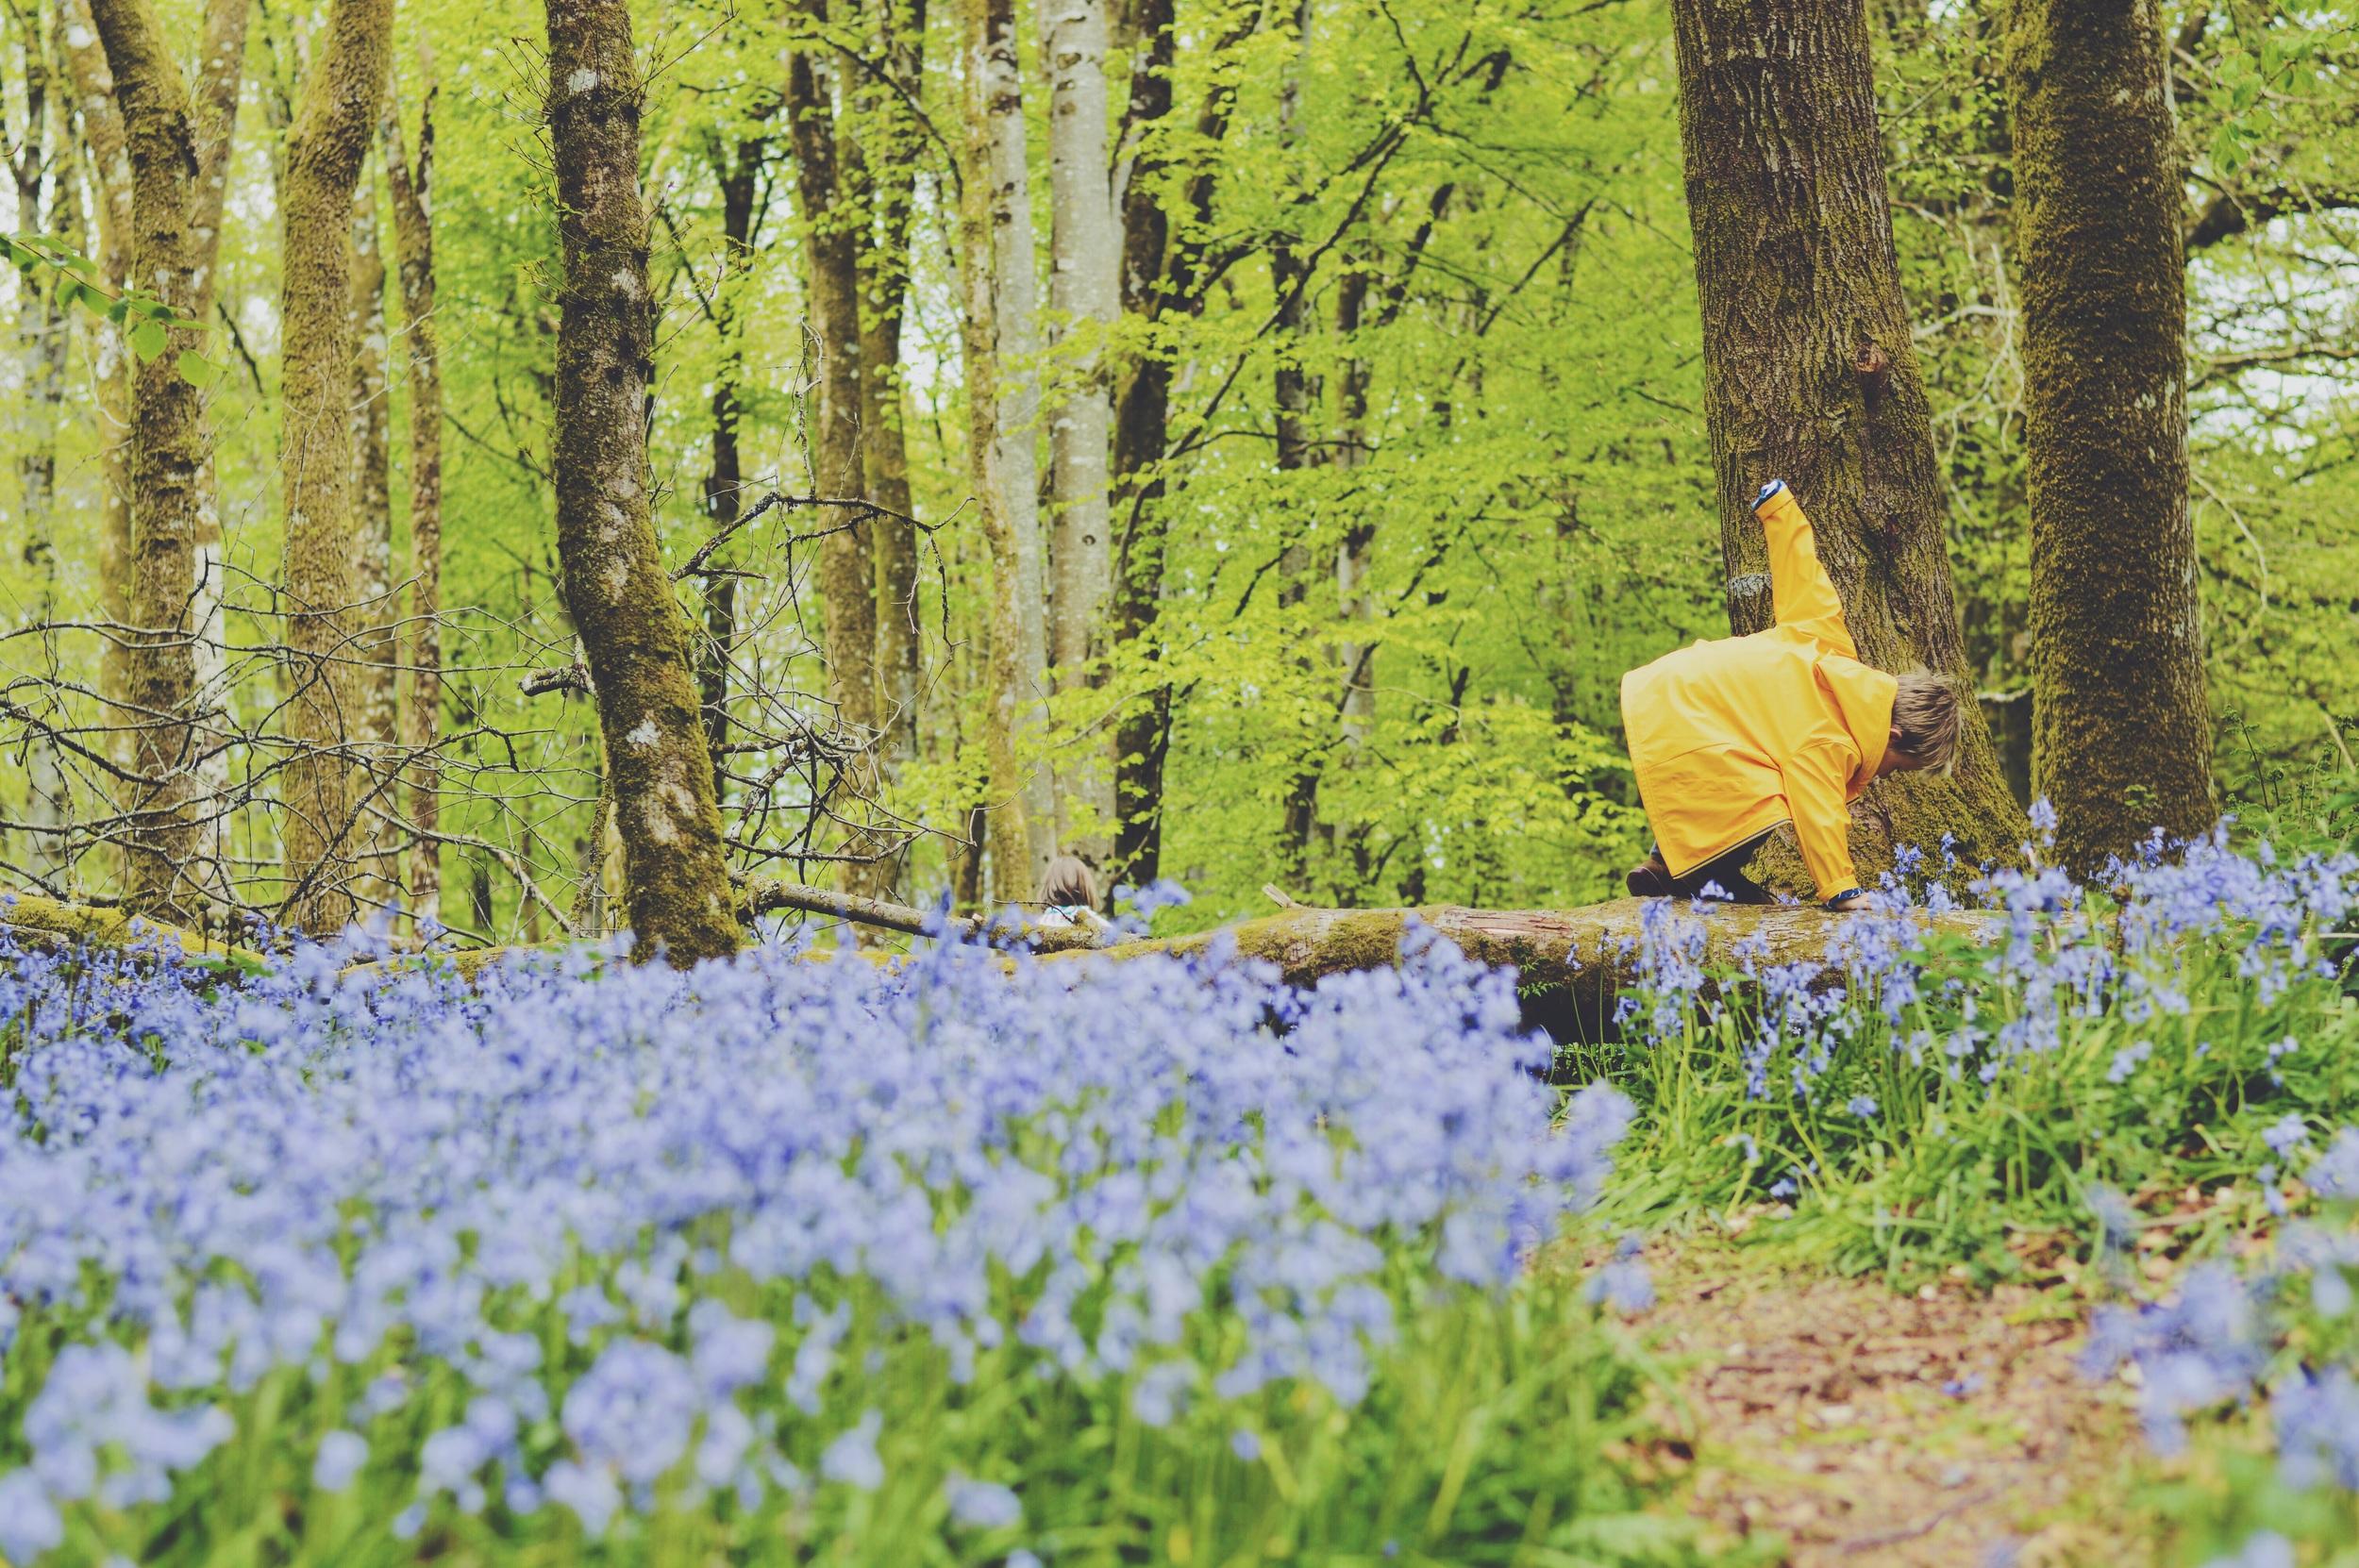 Exploring the bluebells in his Hatley raincoat.